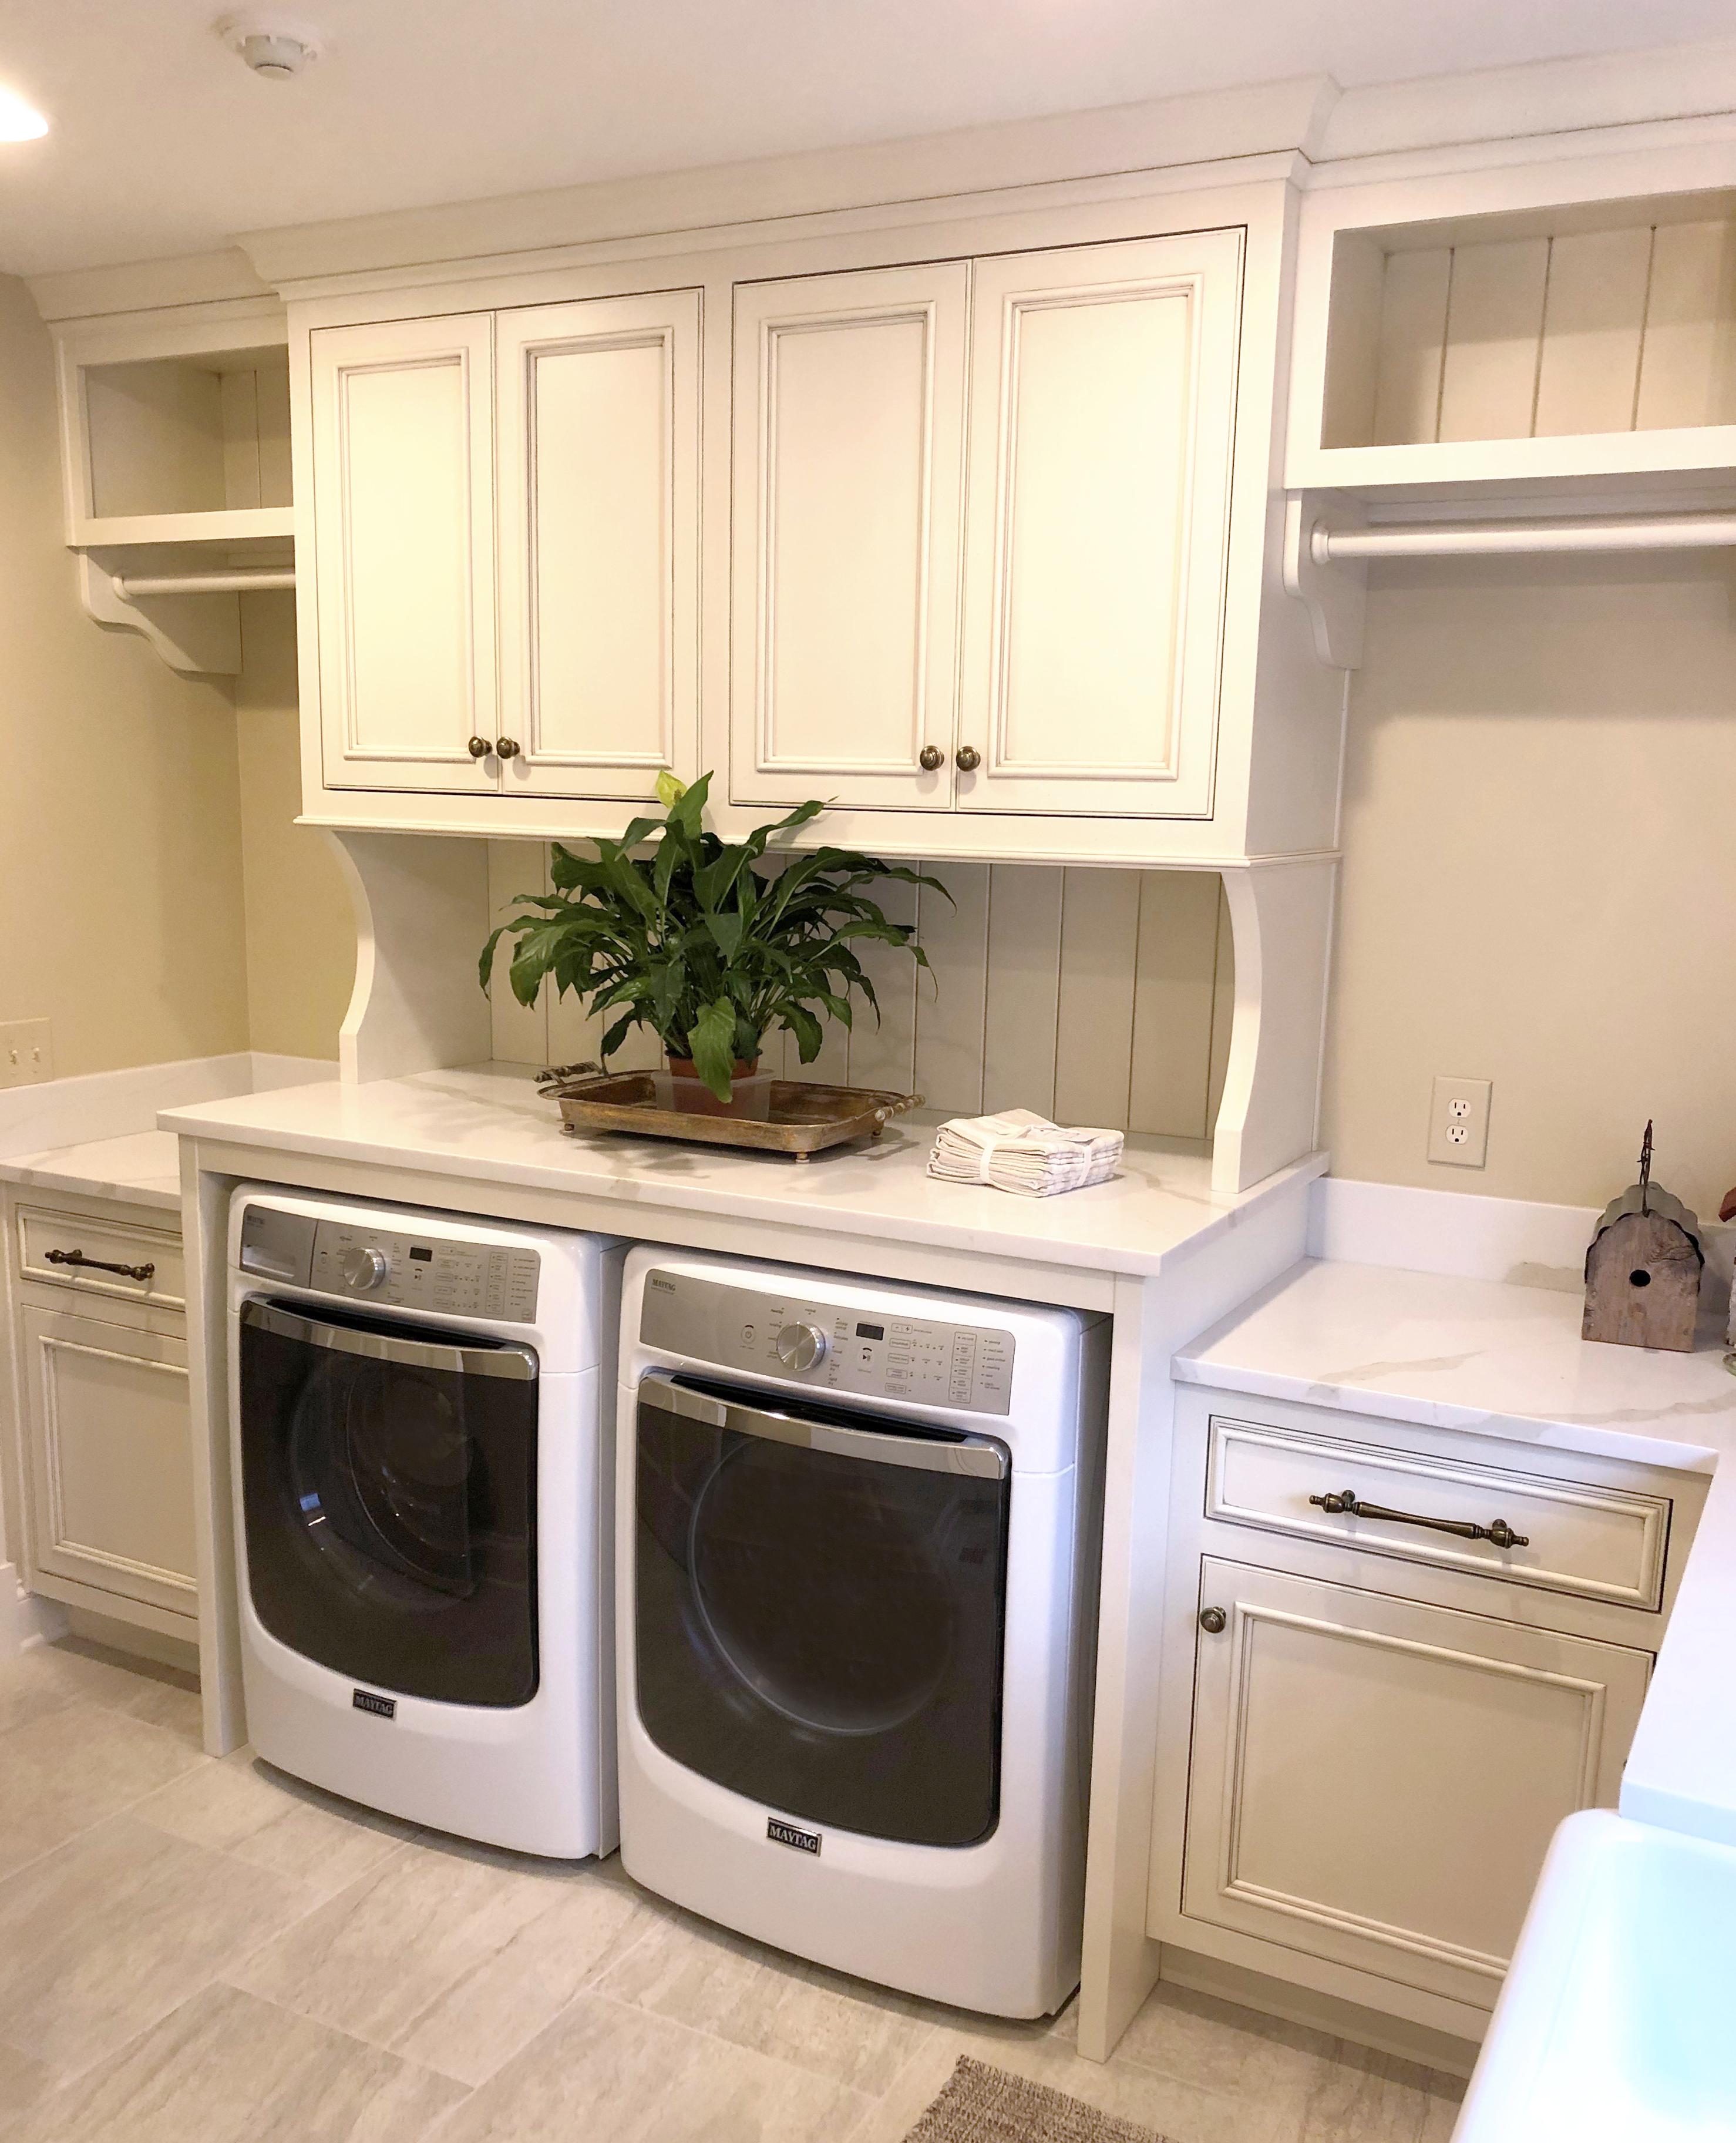 Kitchen Cabinets Evansville In: Laundry Cabinets, Evansville IN